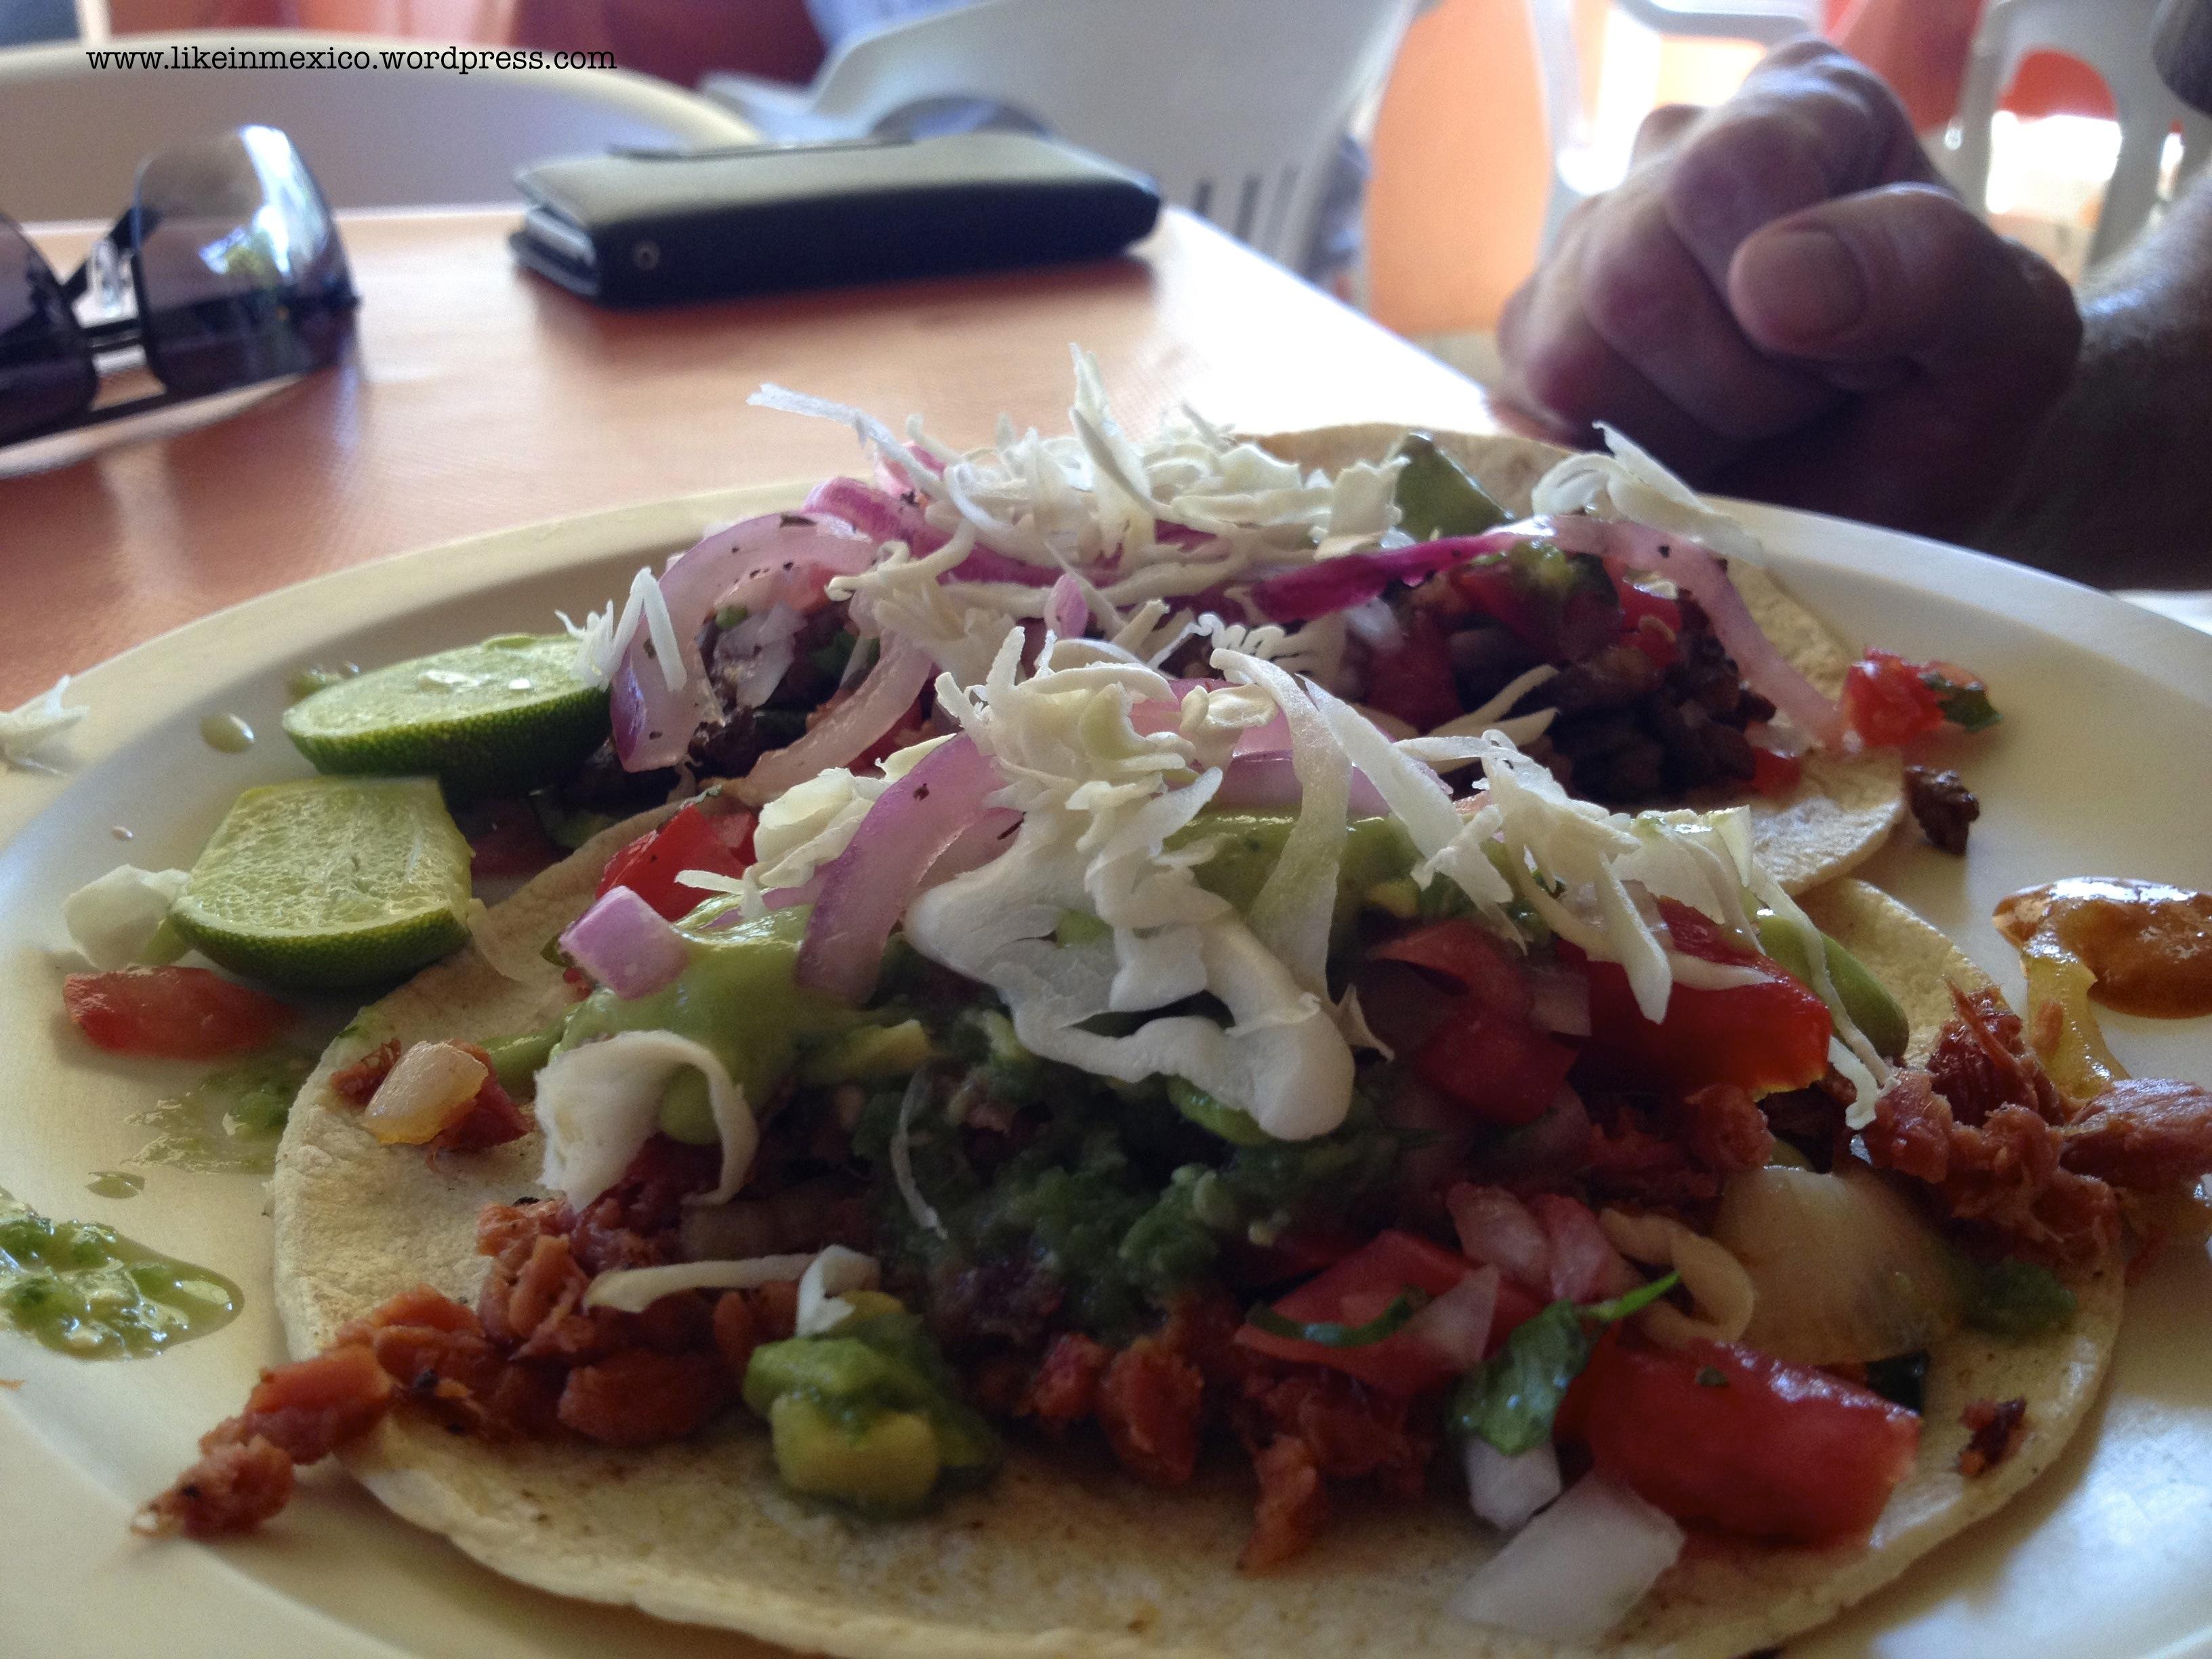 Los cabos 2 baja style tacos recipe likeinmexico for Marlin fish recipes